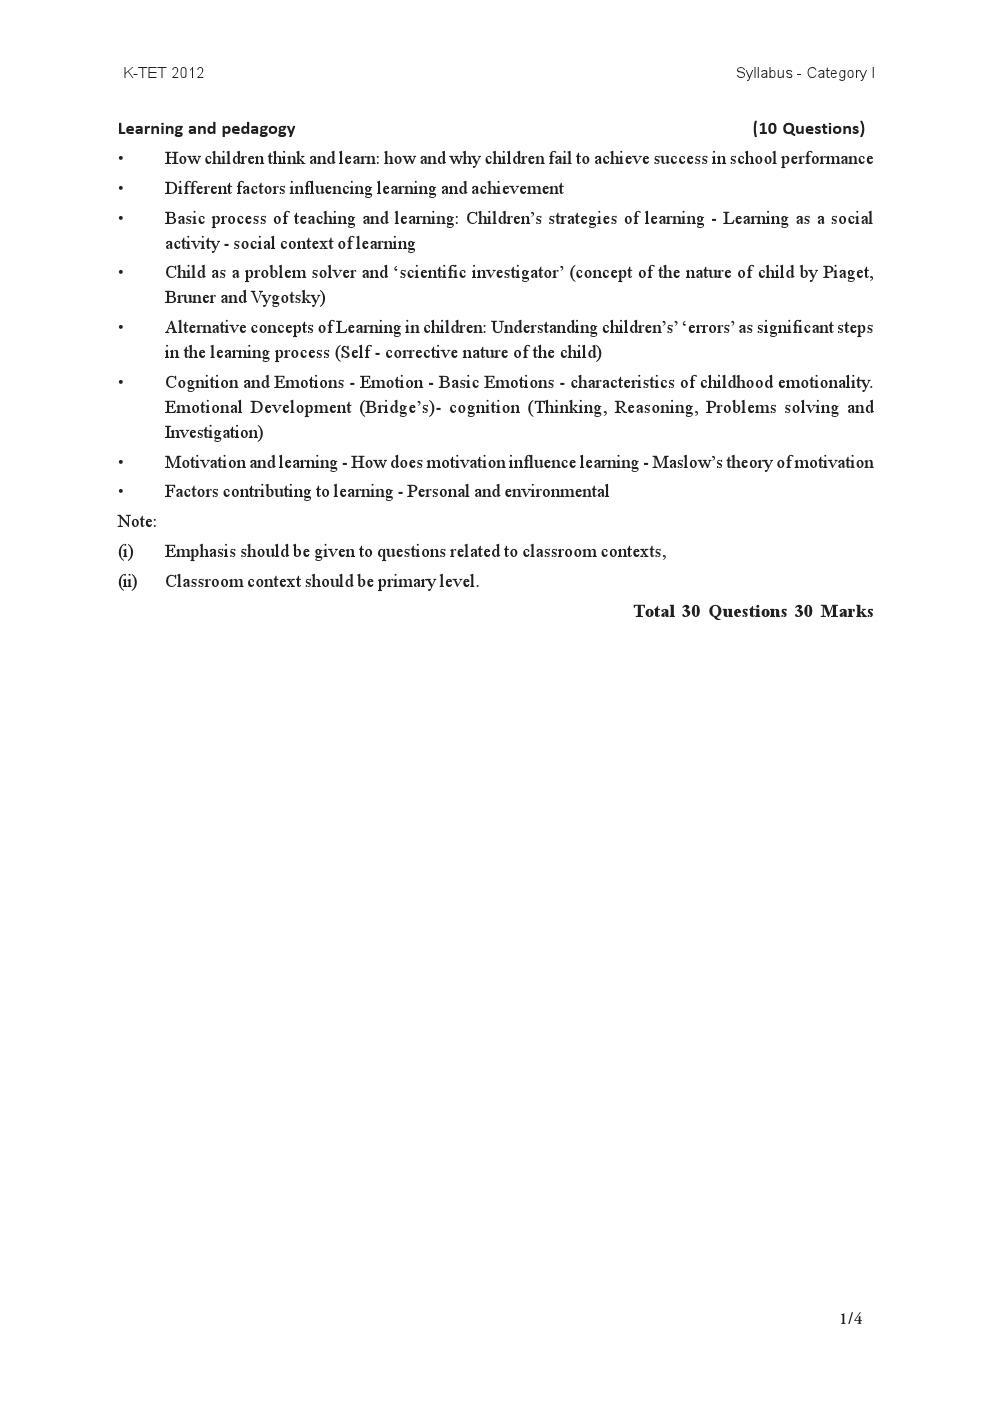 http://masterstudy.net/pdf/syllabus10004.jpg